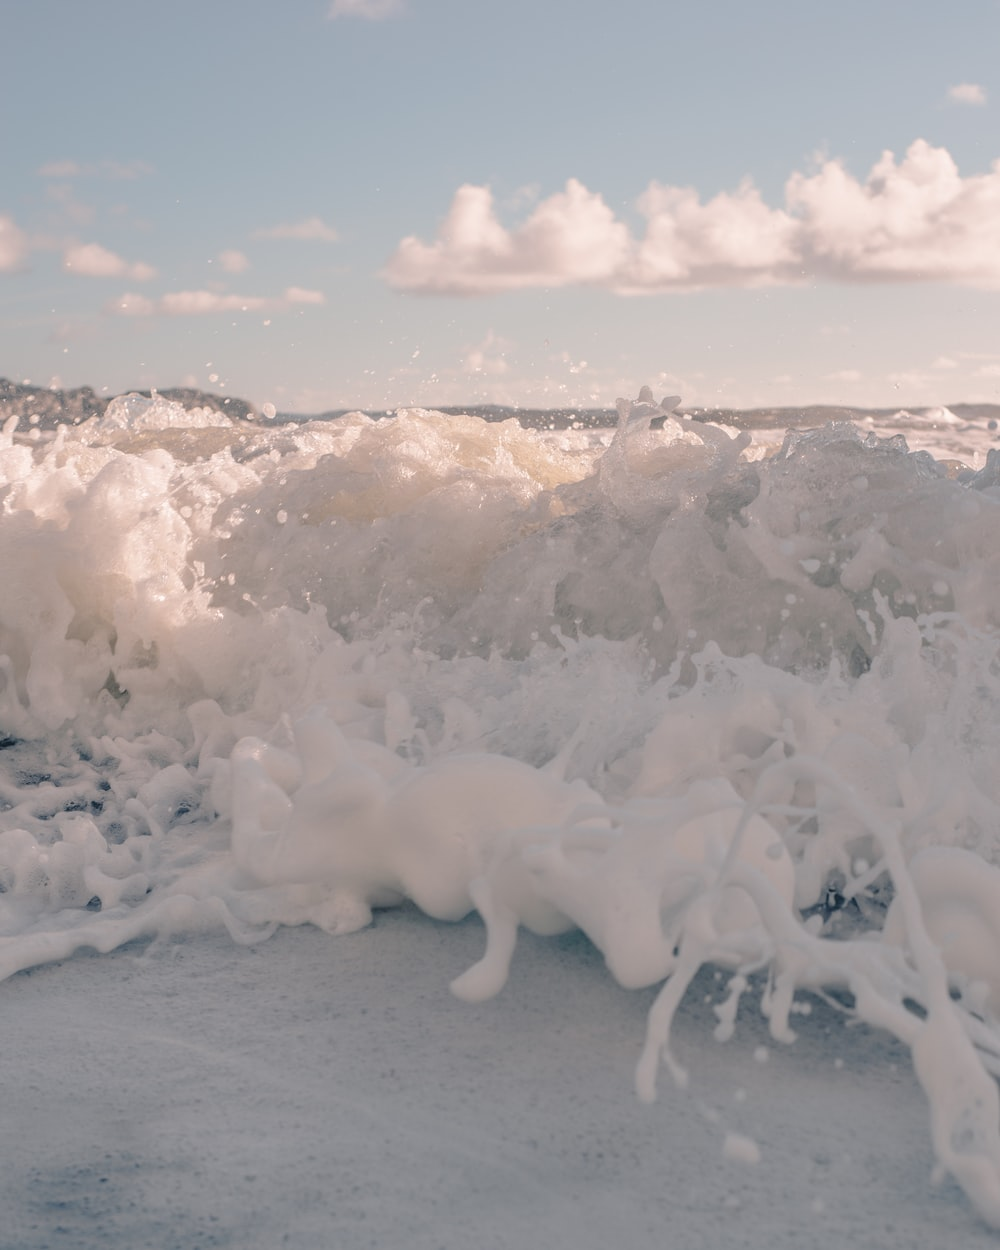 white ice on white sand during daytime